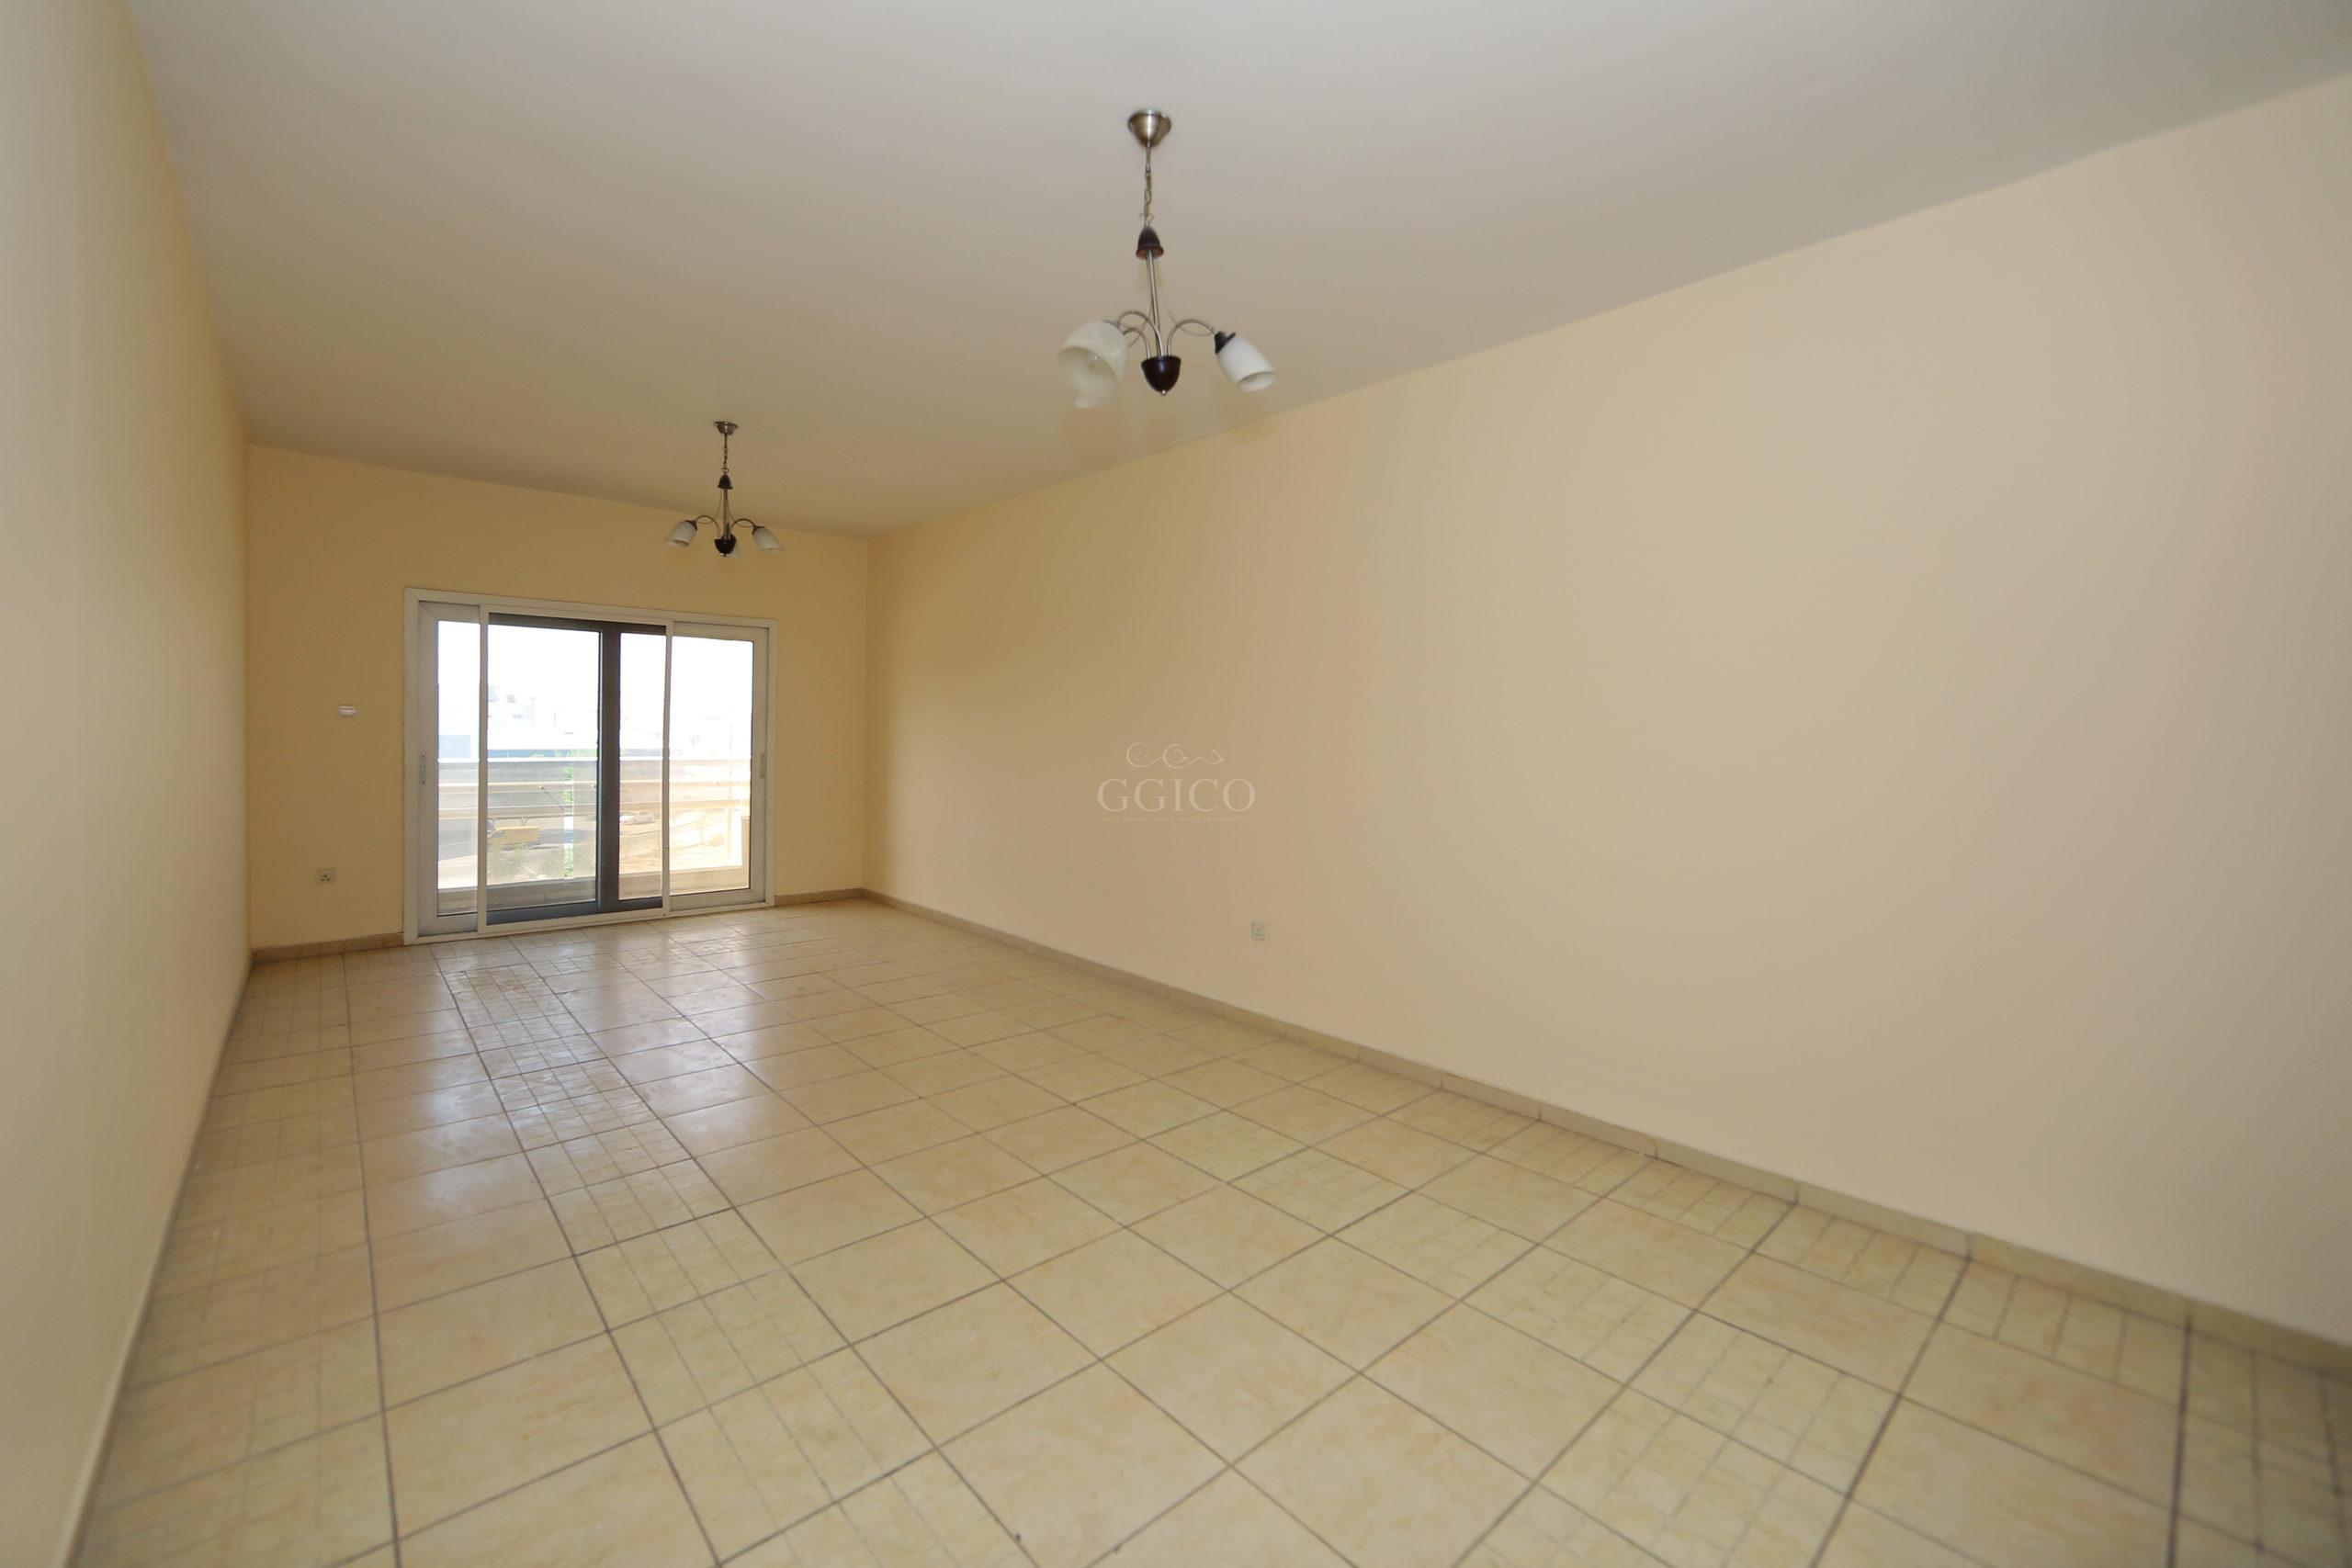 2 bedroom apartment for rent in muwaileh sharjah